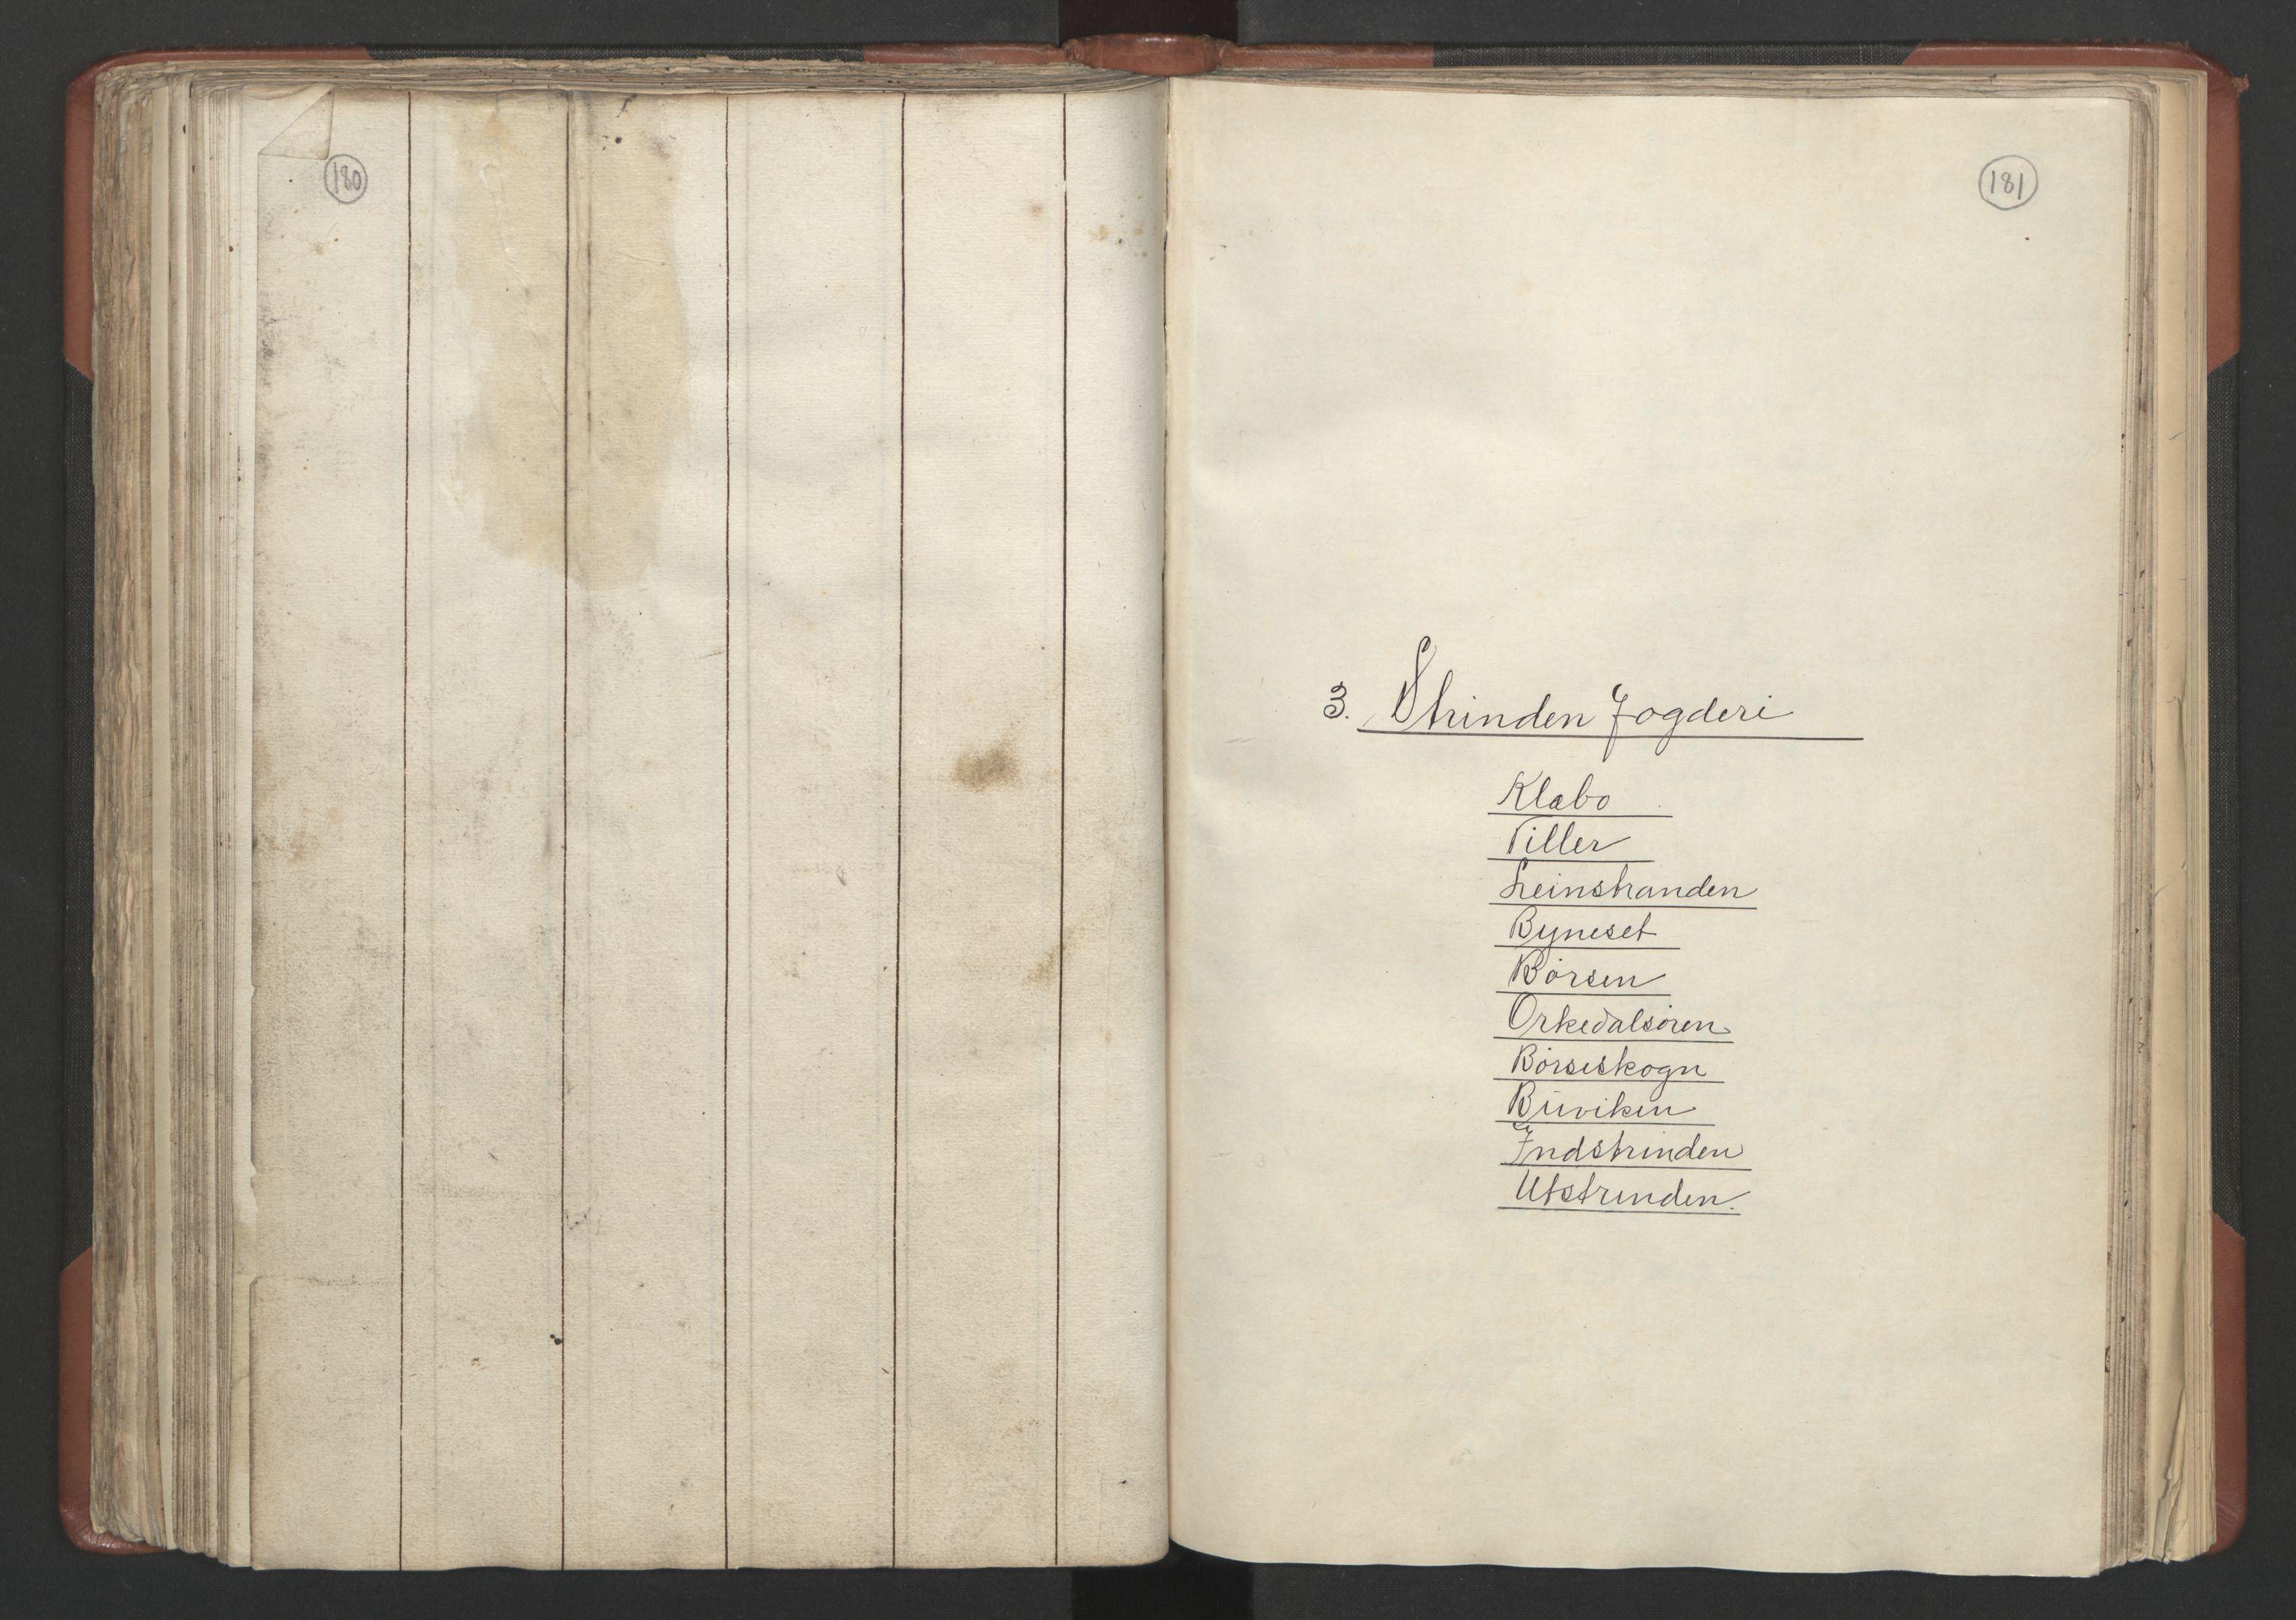 RA, Fogdenes og sorenskrivernes manntall 1664-1666, nr. 18: Gauldal fogderi, Strinda fogderi og Orkdal fogderi, 1664, s. 180-181